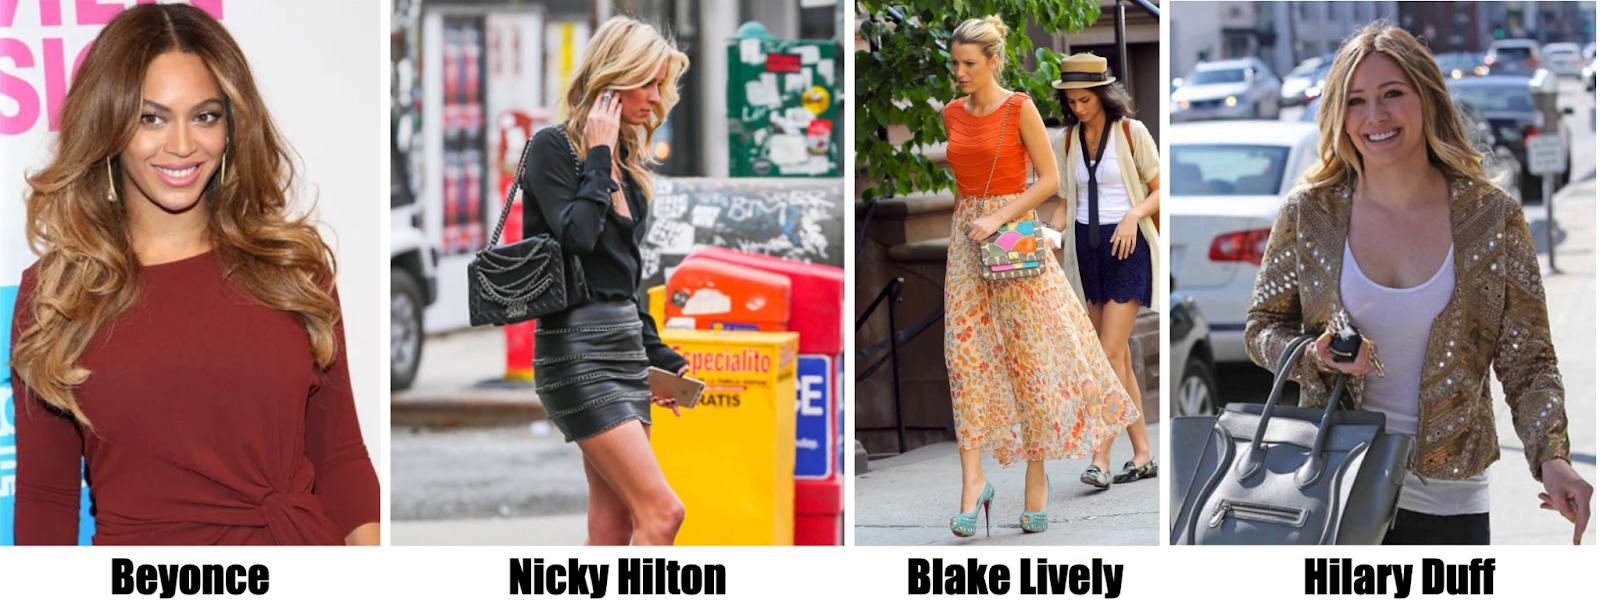 celebrities wearing Haute Hippie Clothing